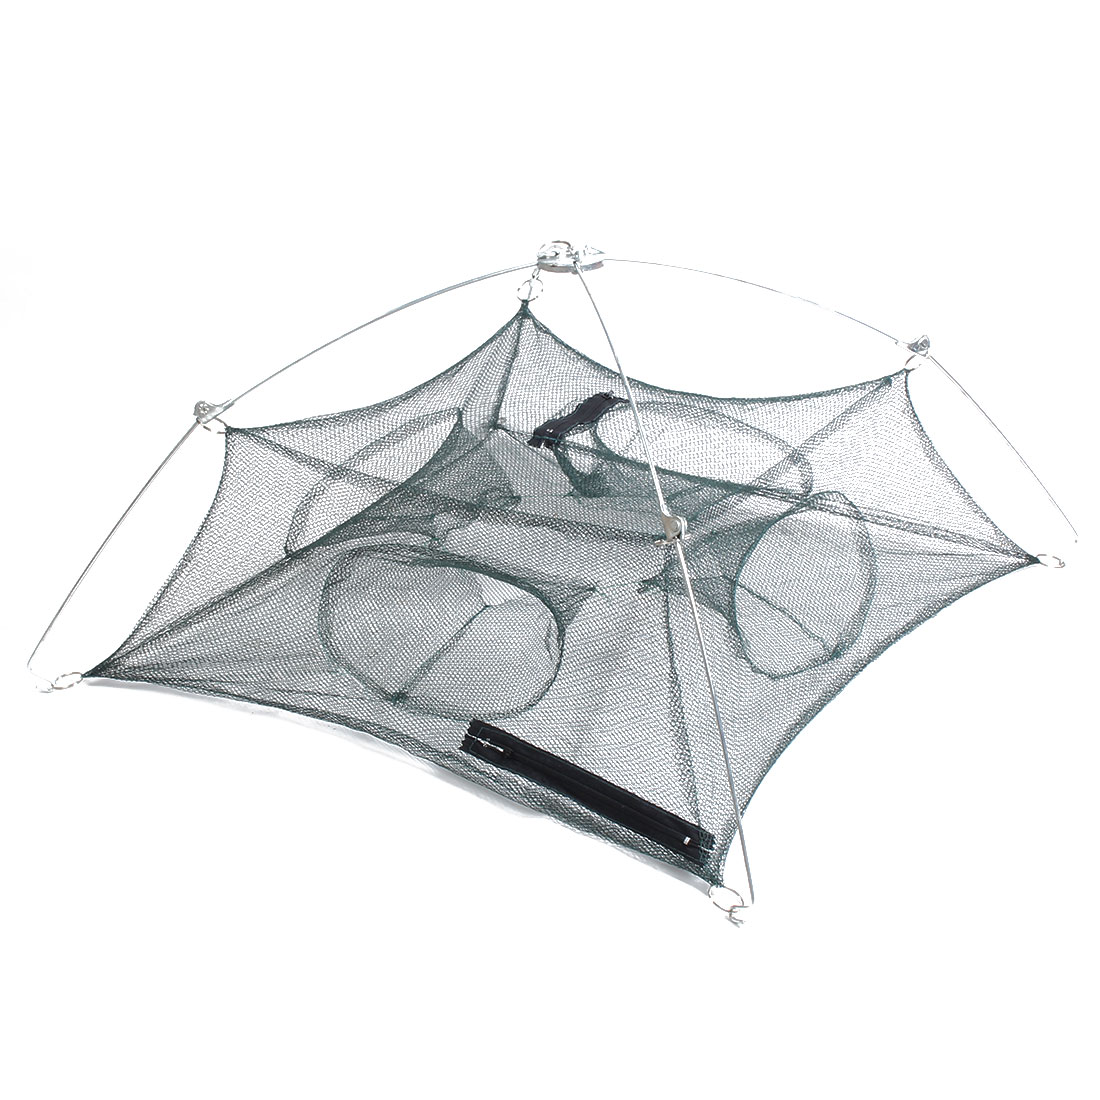 Outside Fishing Tool Telescopic Shrimp Eel Crab Bait Cast Fishing Umbrella Dip Net